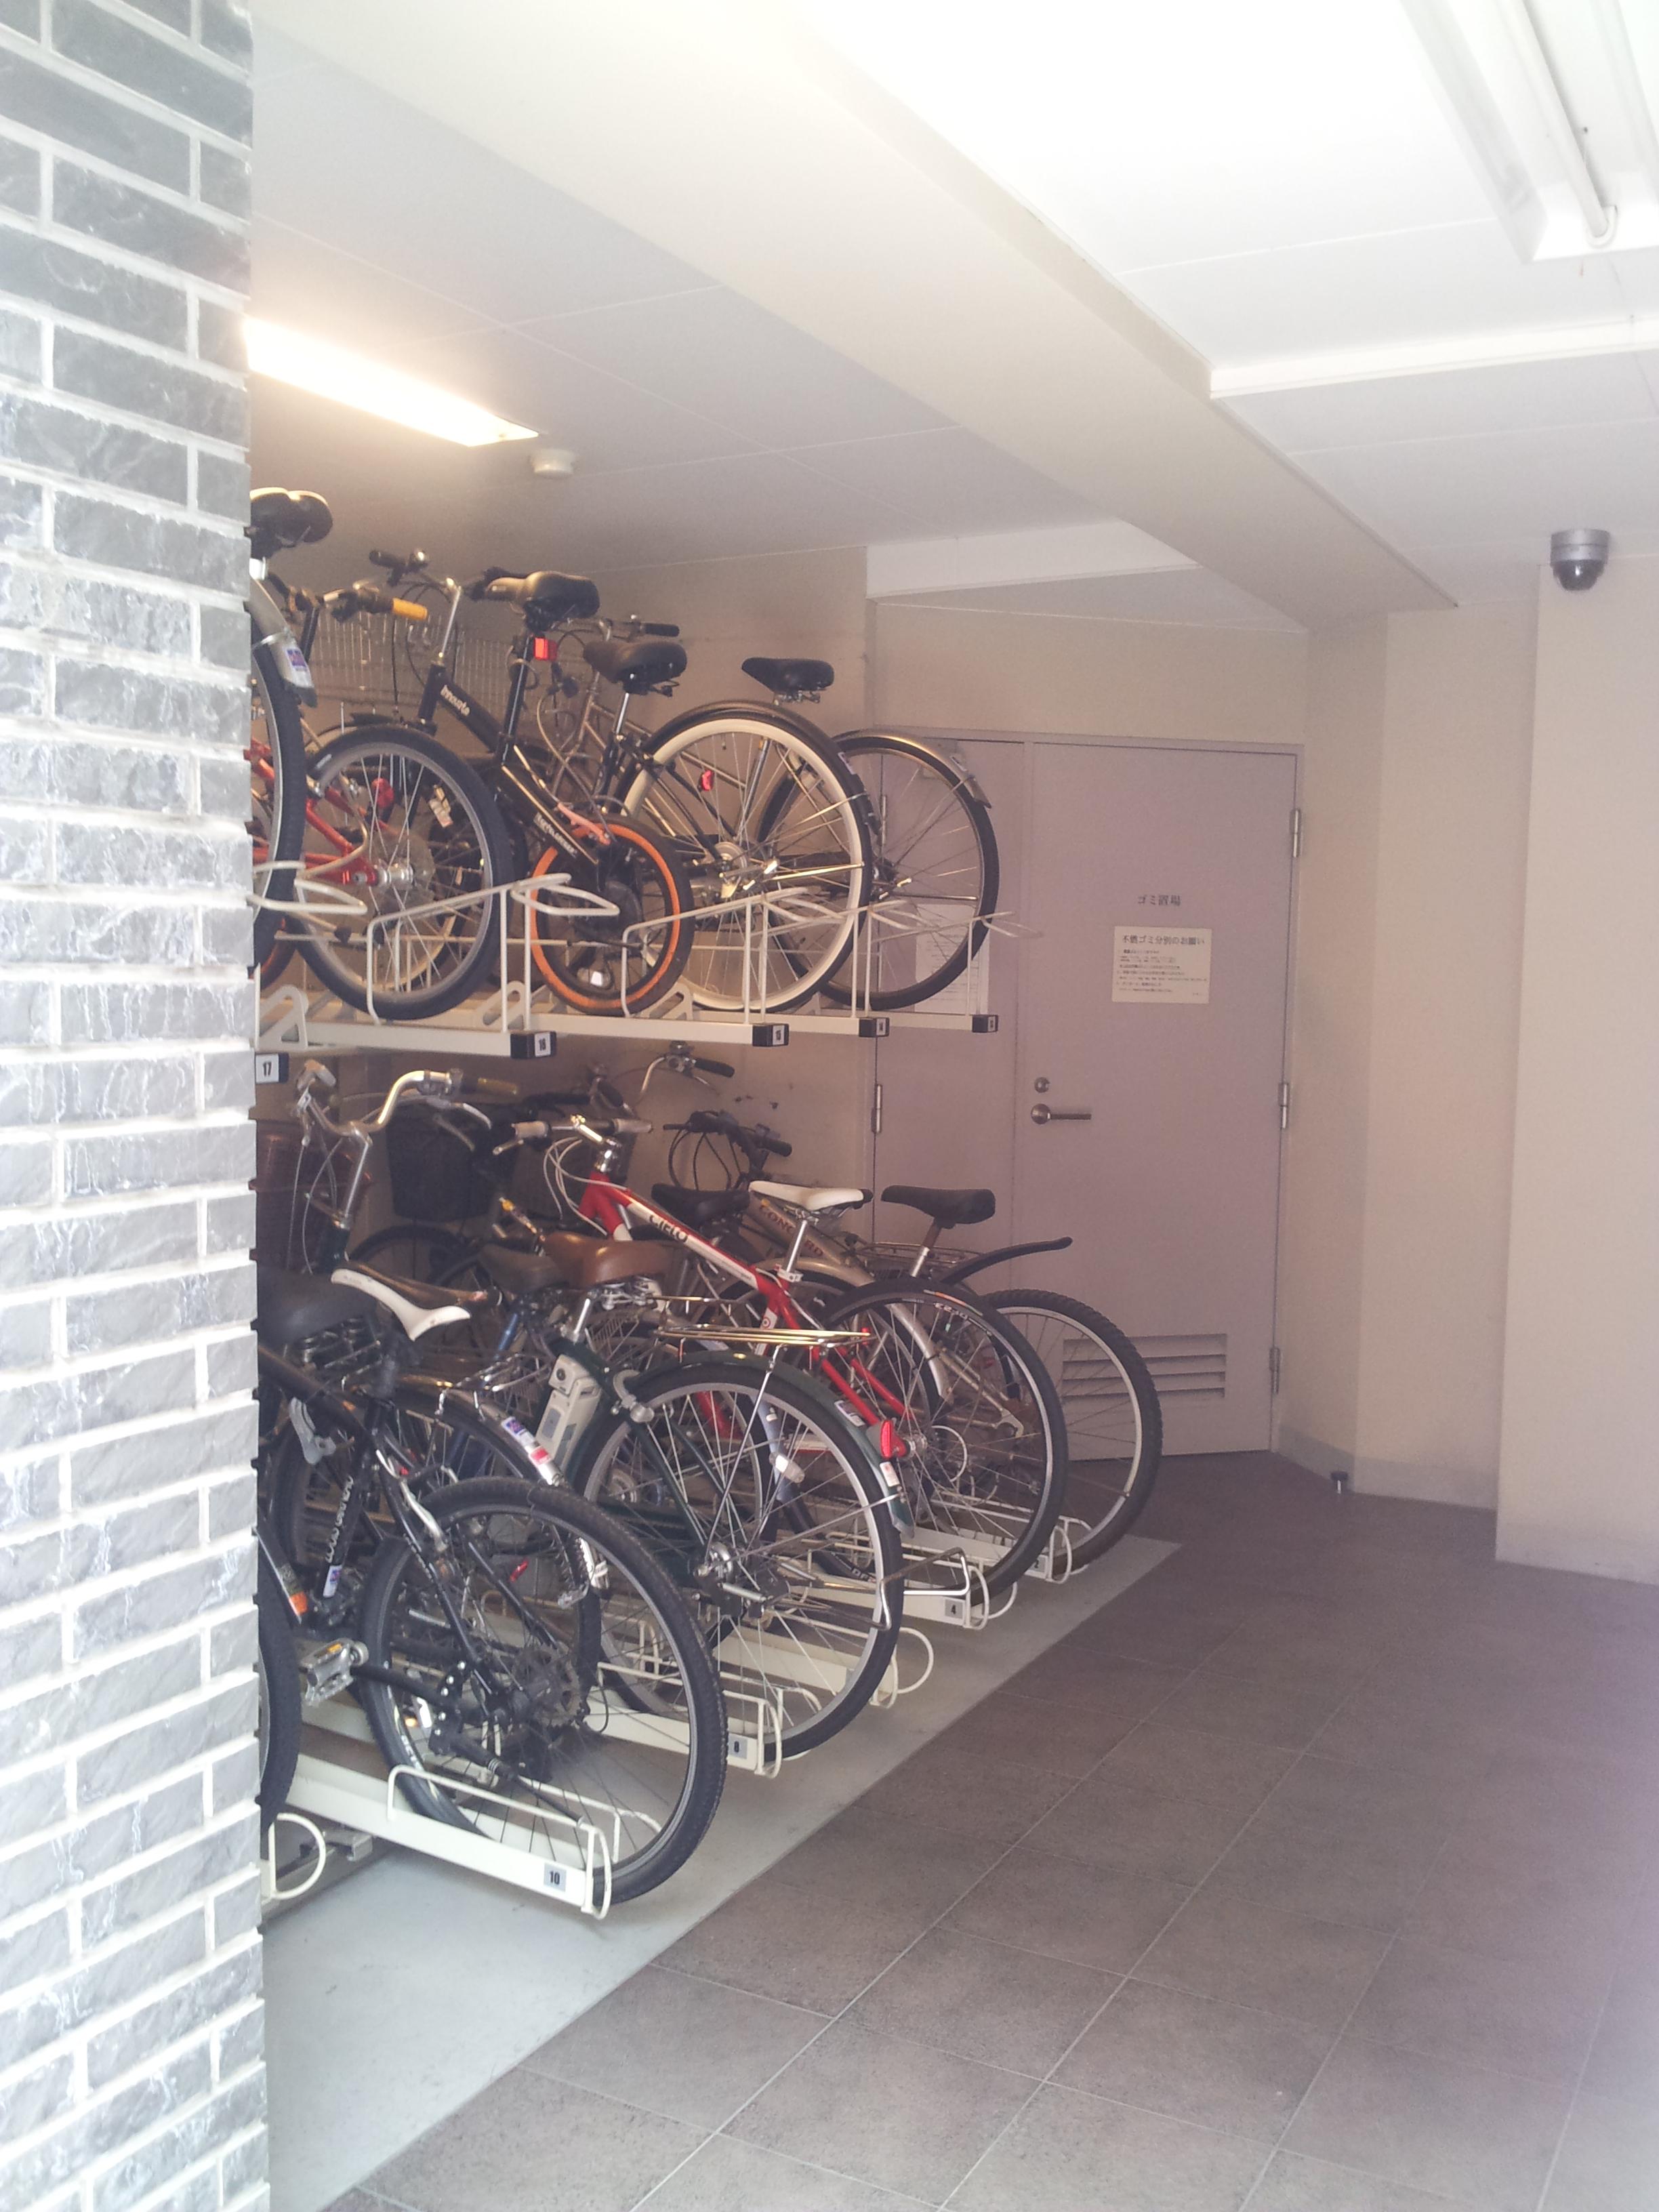 KIST原宿の駐輪場写真になります